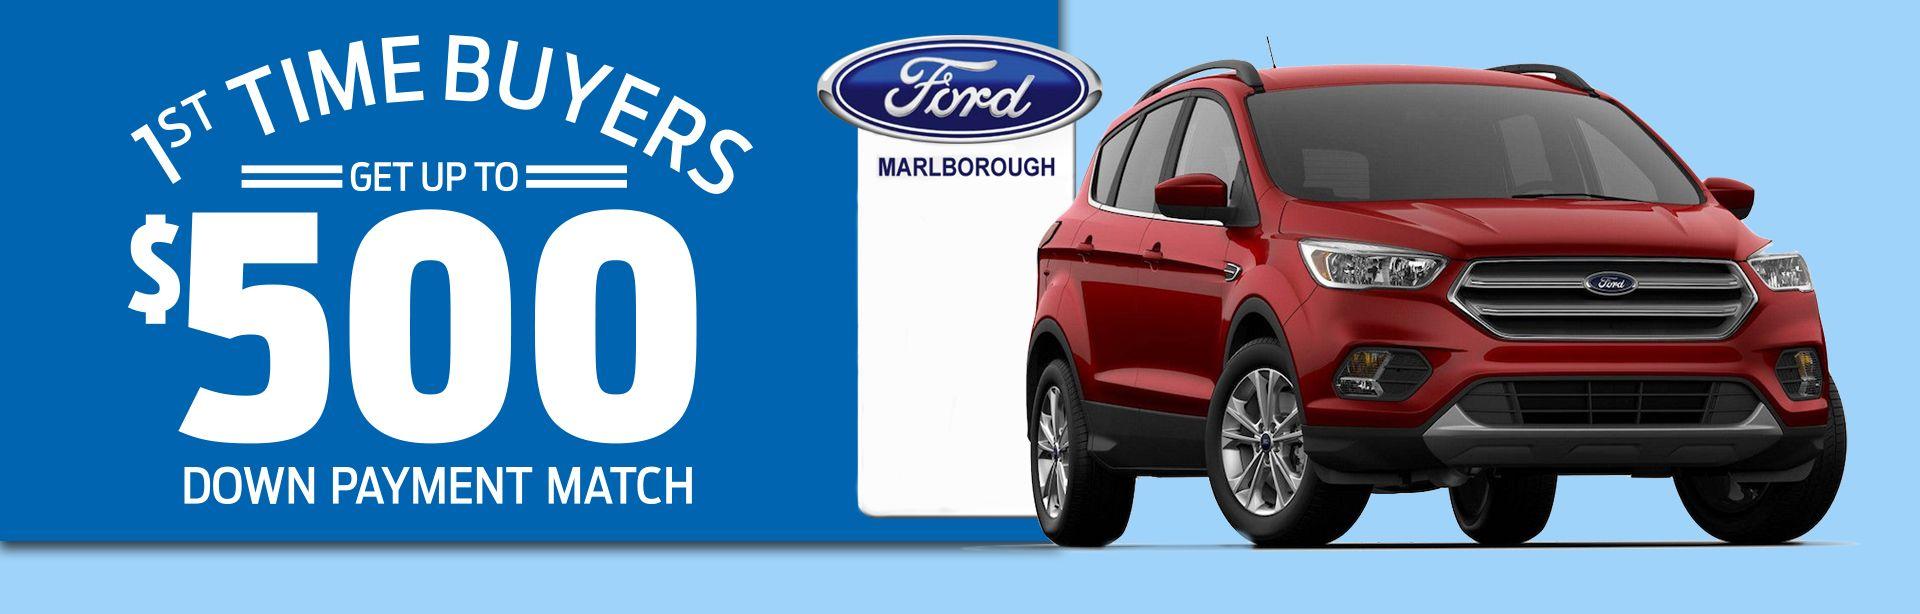 First_time_buyer_program_at_Marlborough_Ford